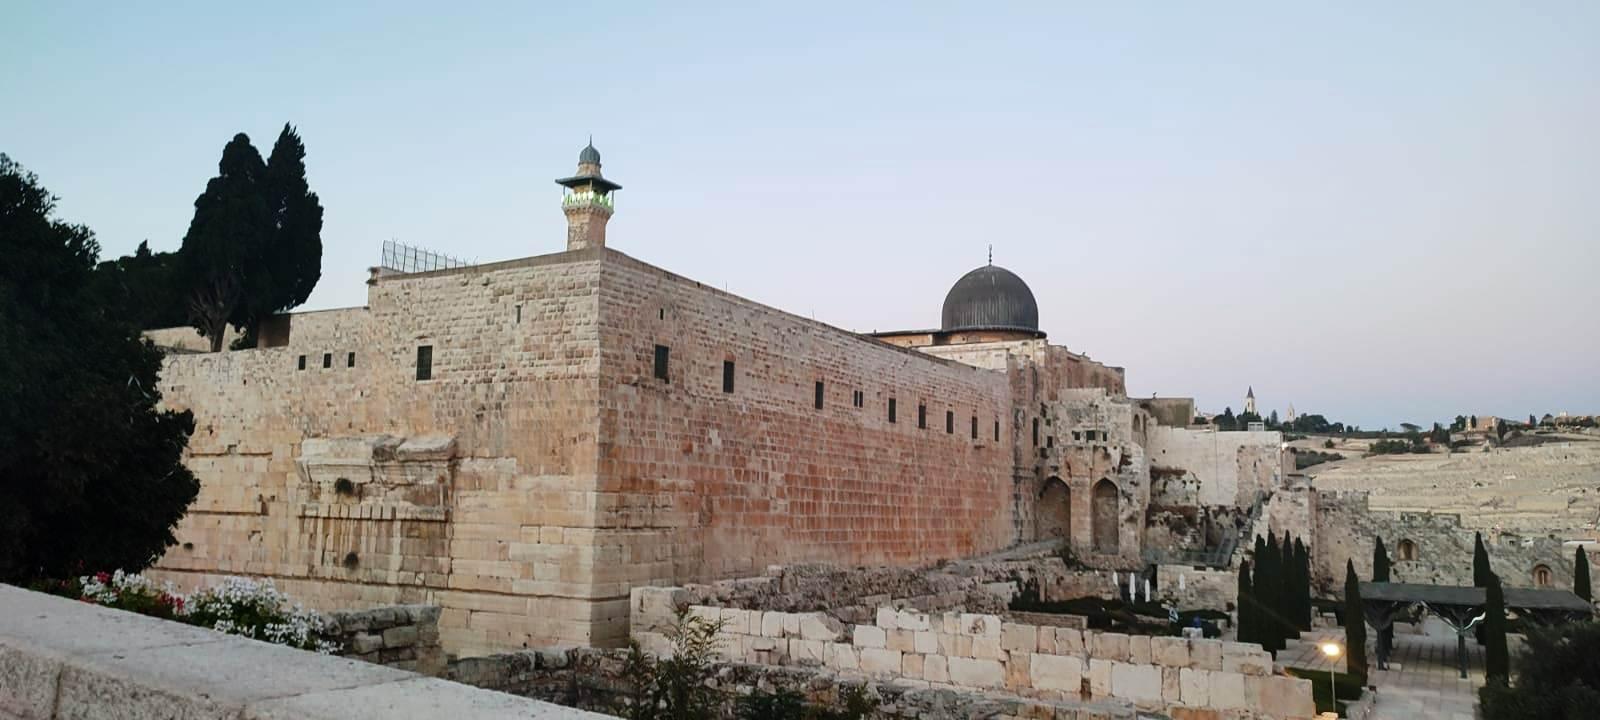 13. Вид с площади у стены Плача